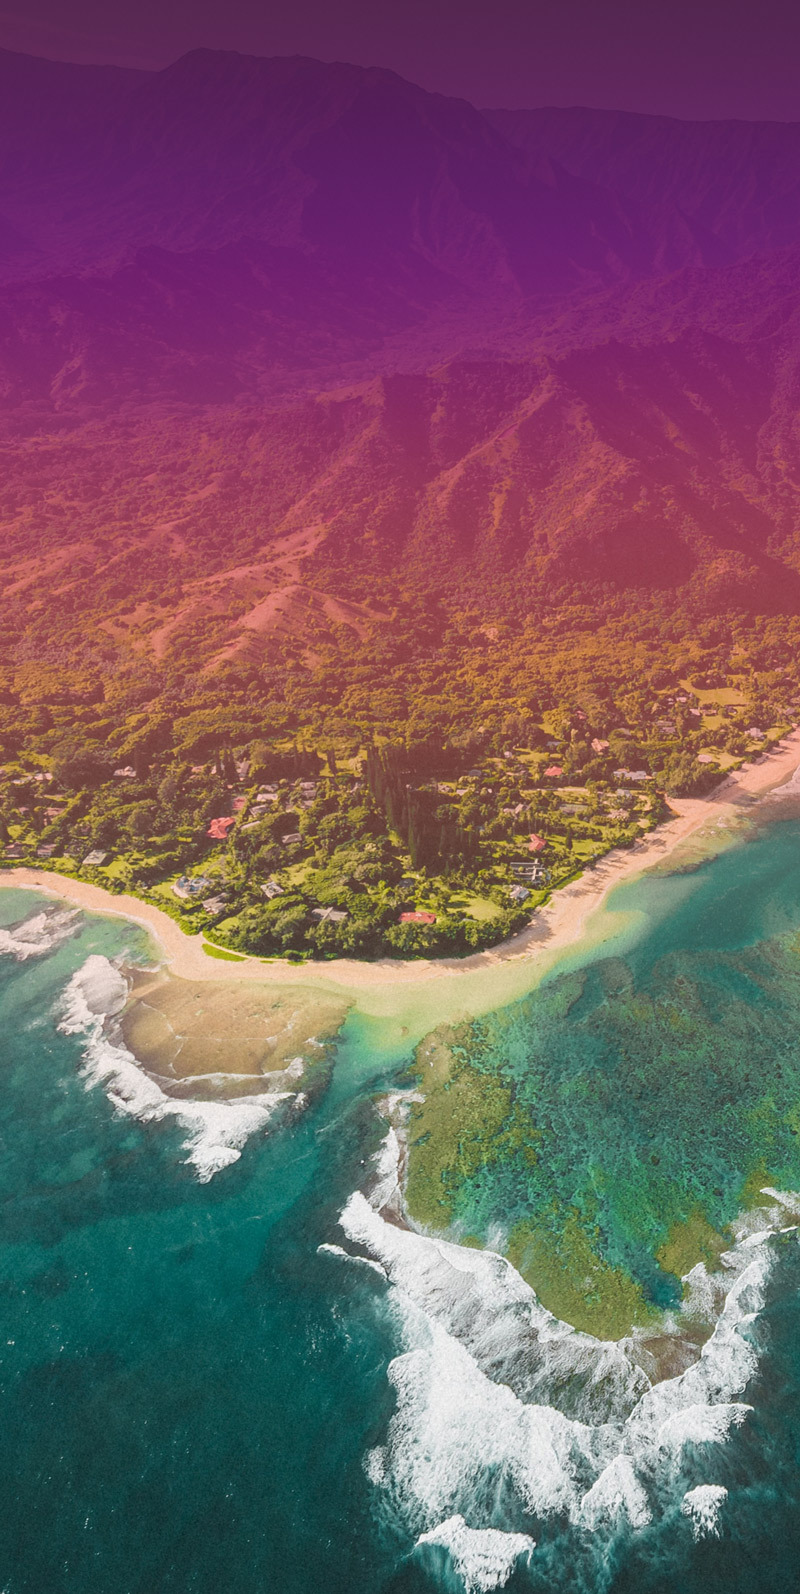 Image of 0221 Lumedic Hawaii with Overlay Vertical